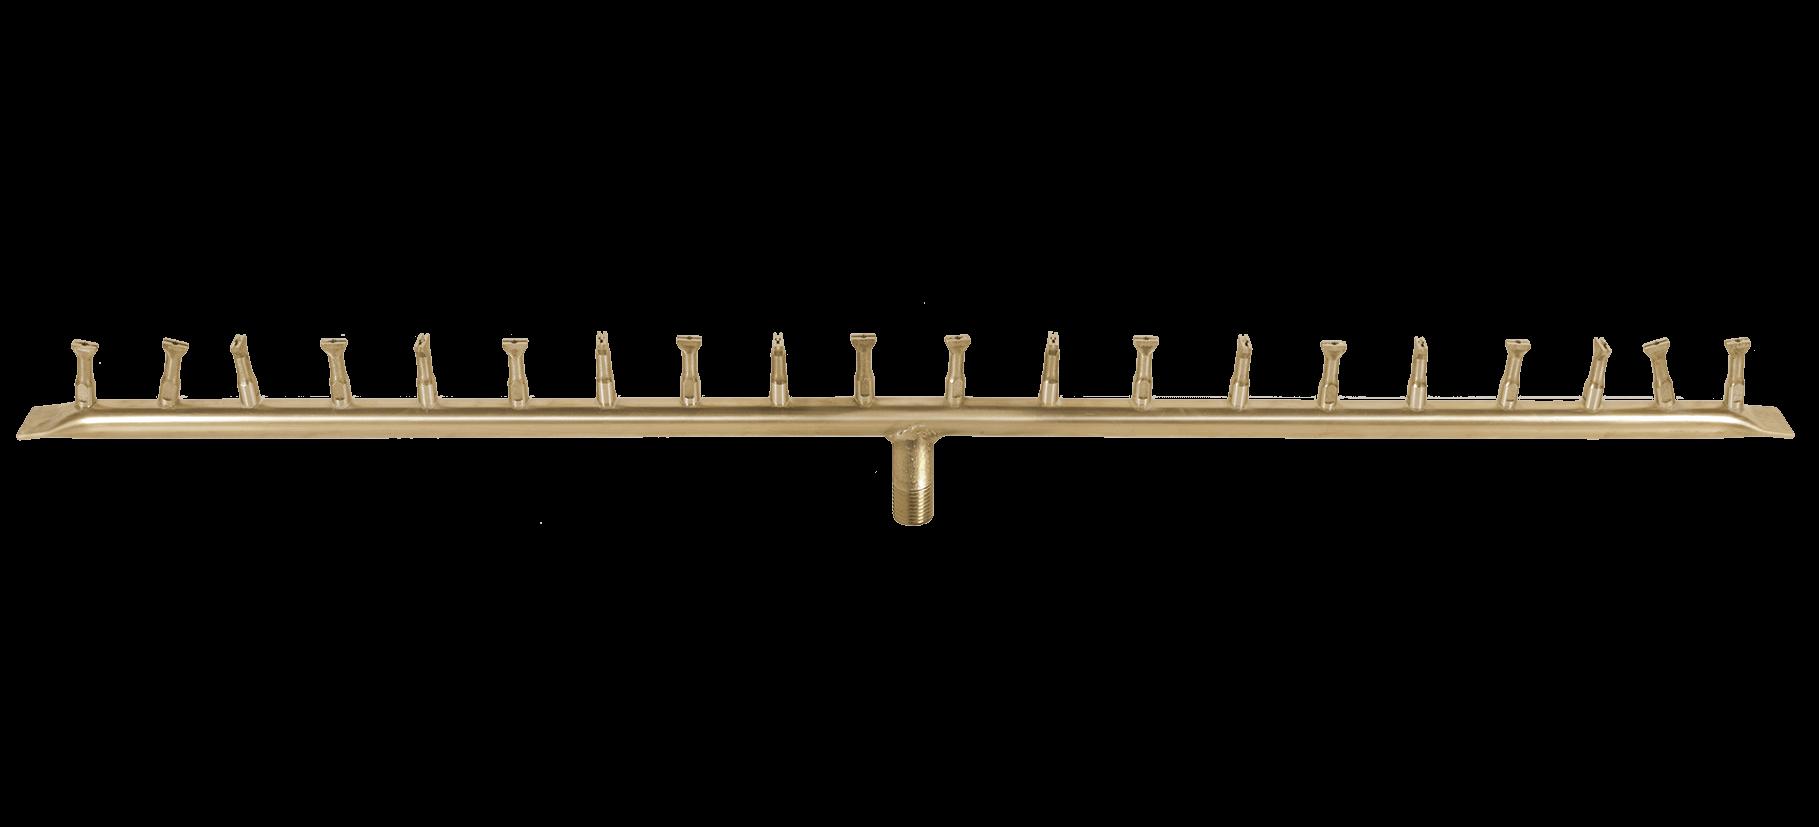 Linear-bullet-burner-brass-gas-fire-pit-kit-inserts